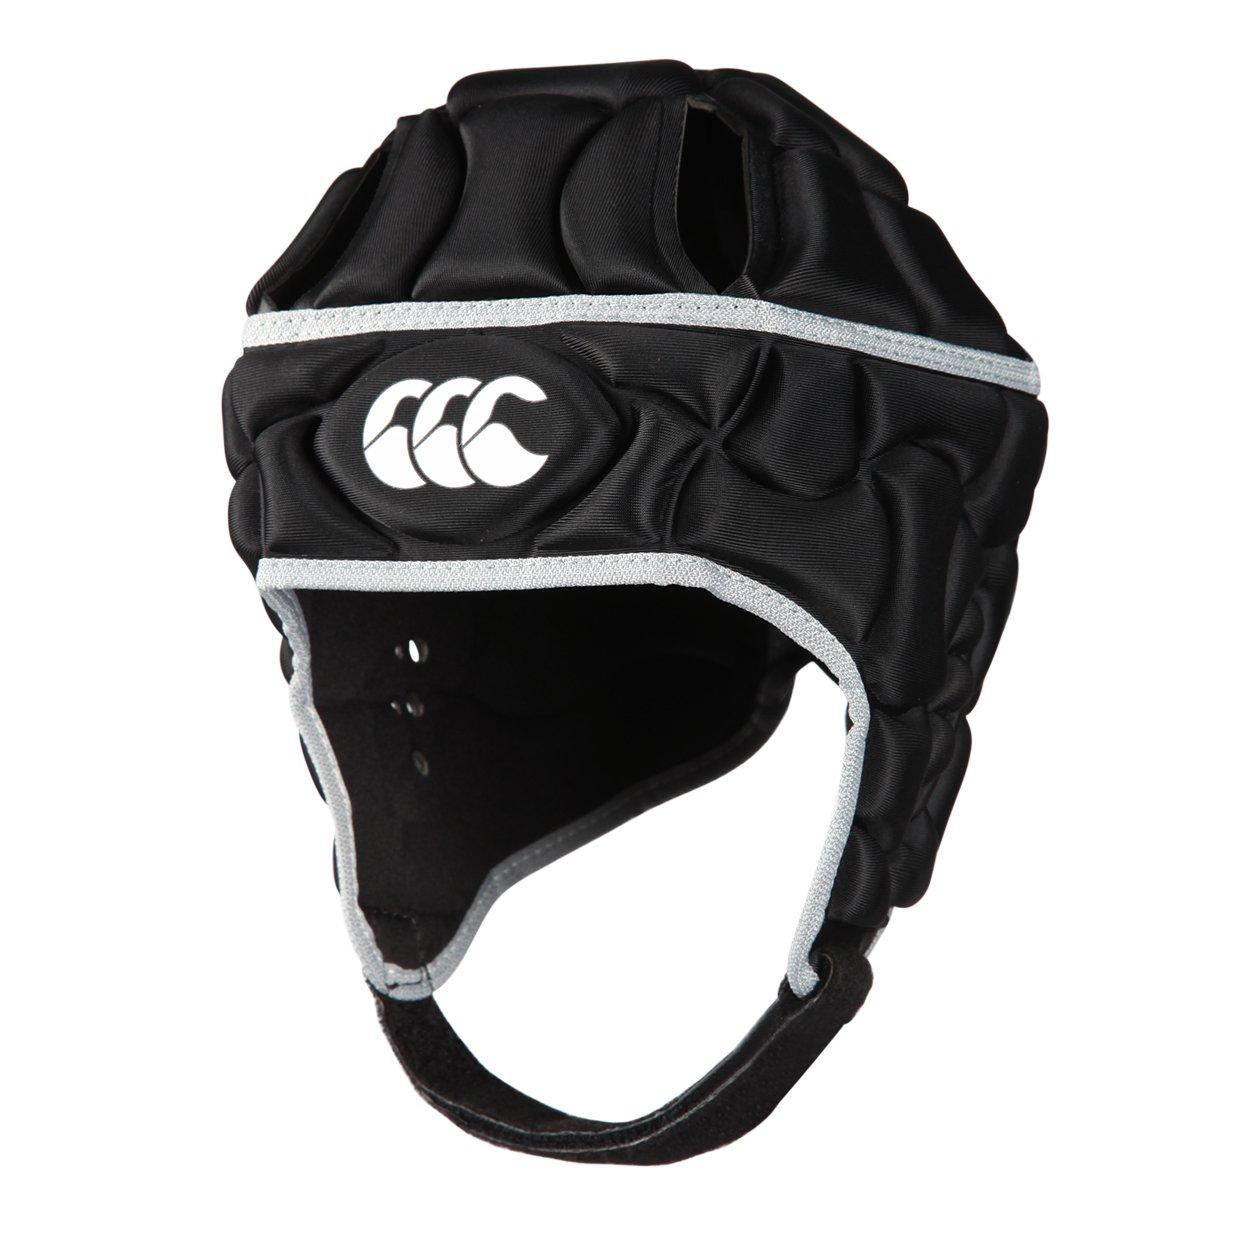 Canterbury Club Plus Headgear 210 Brands Inc. Z011060-Small-Black-P